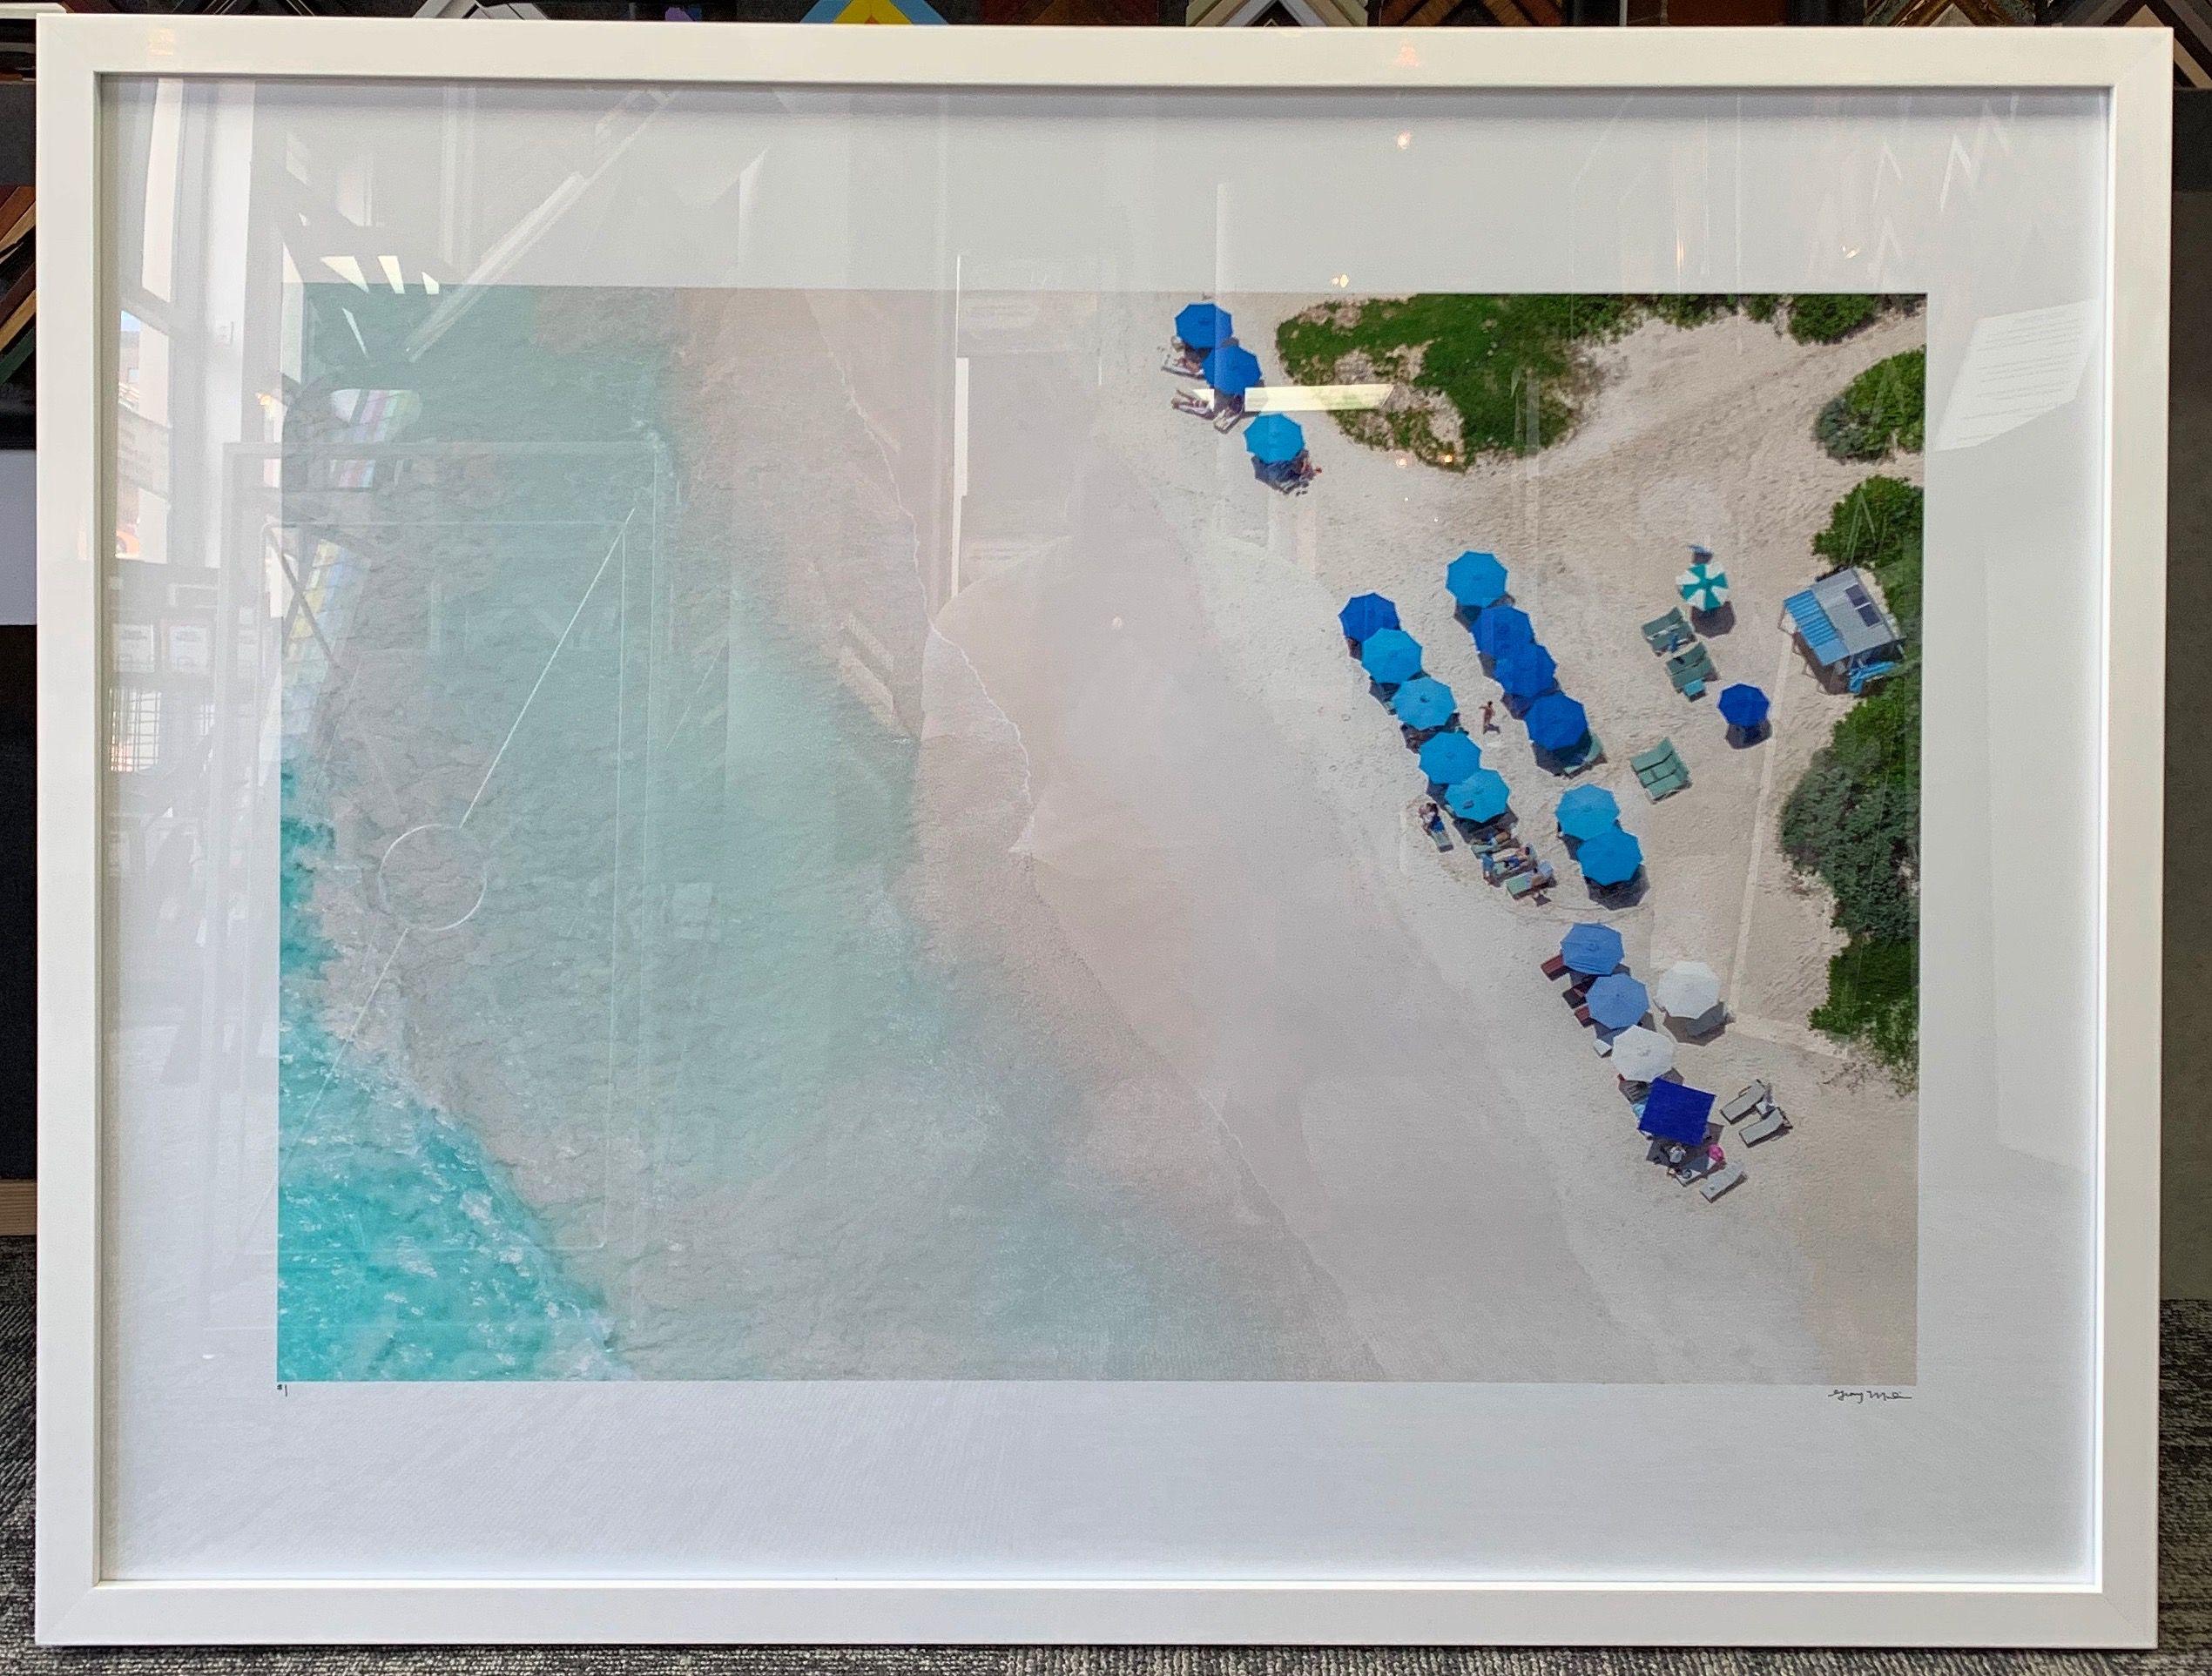 Pin on Art, Framing & Photography 5280 Custom Framing